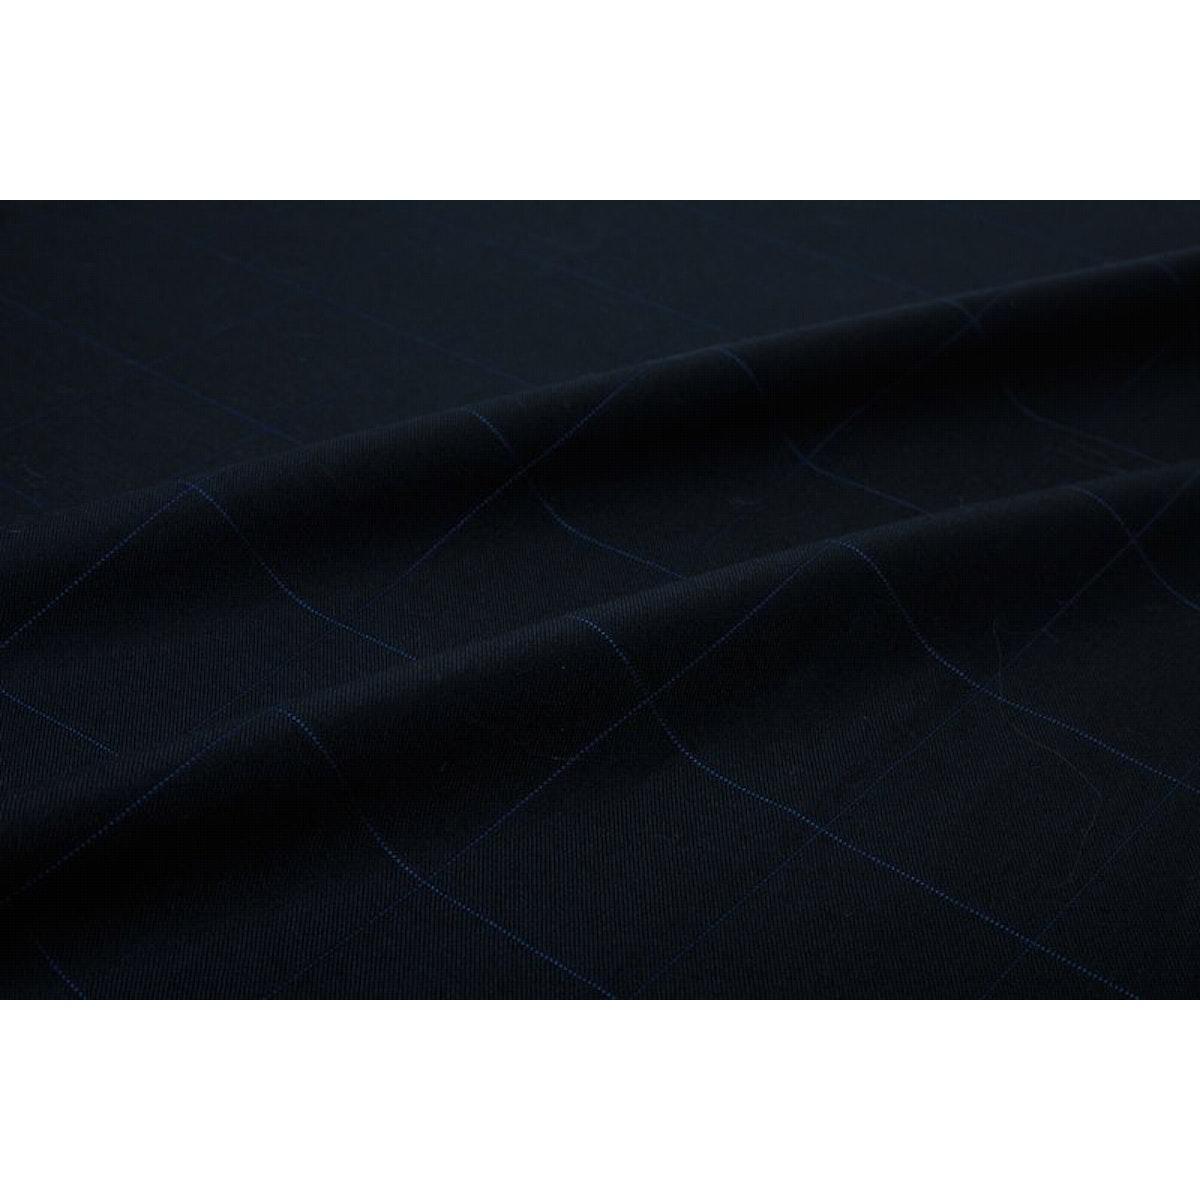 InStitchu Suit Fabric 125